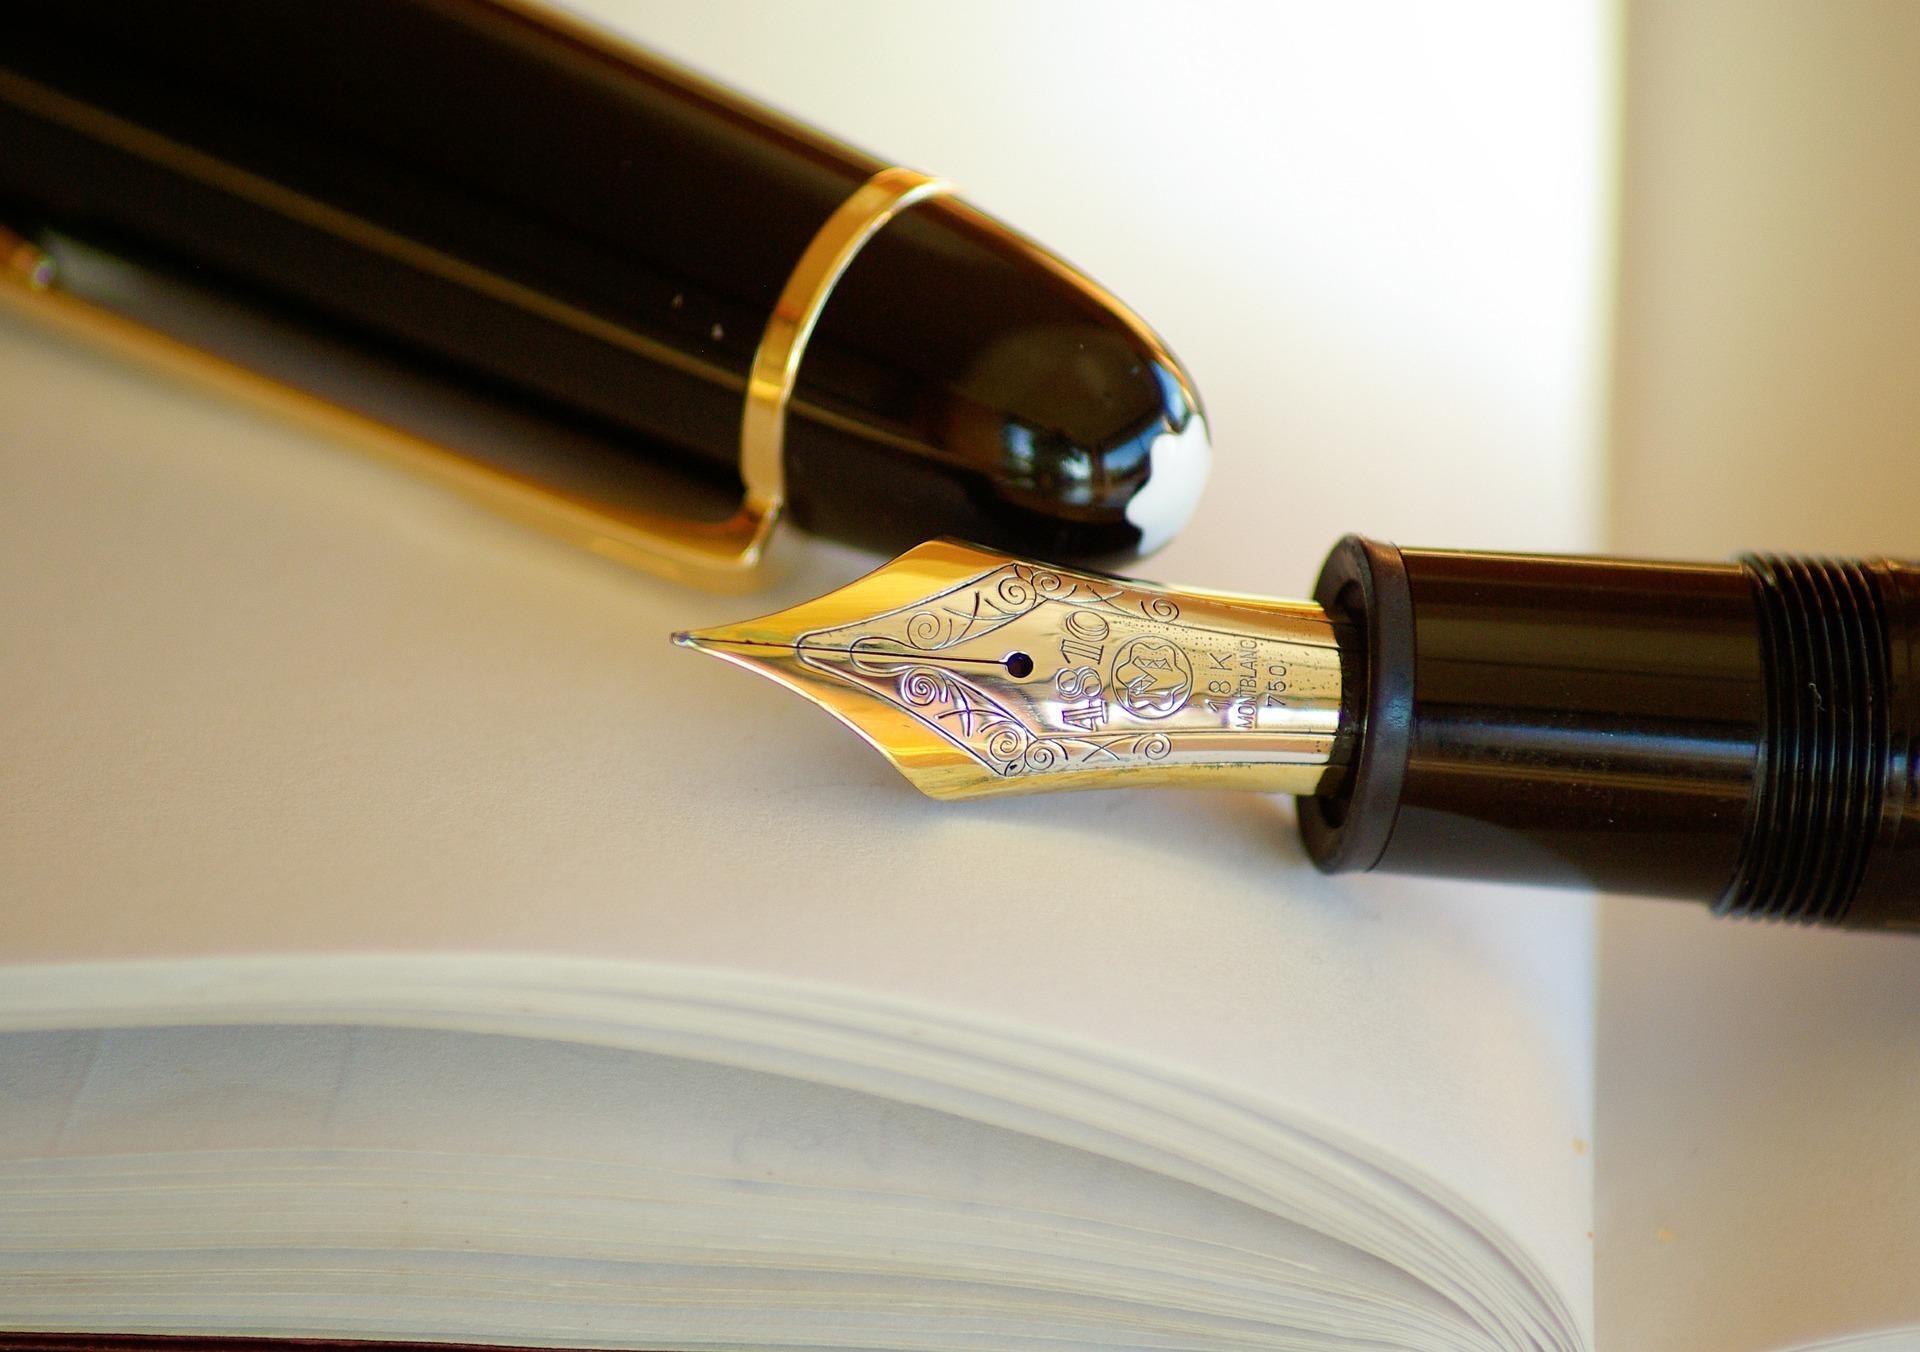 Ein edler Füller